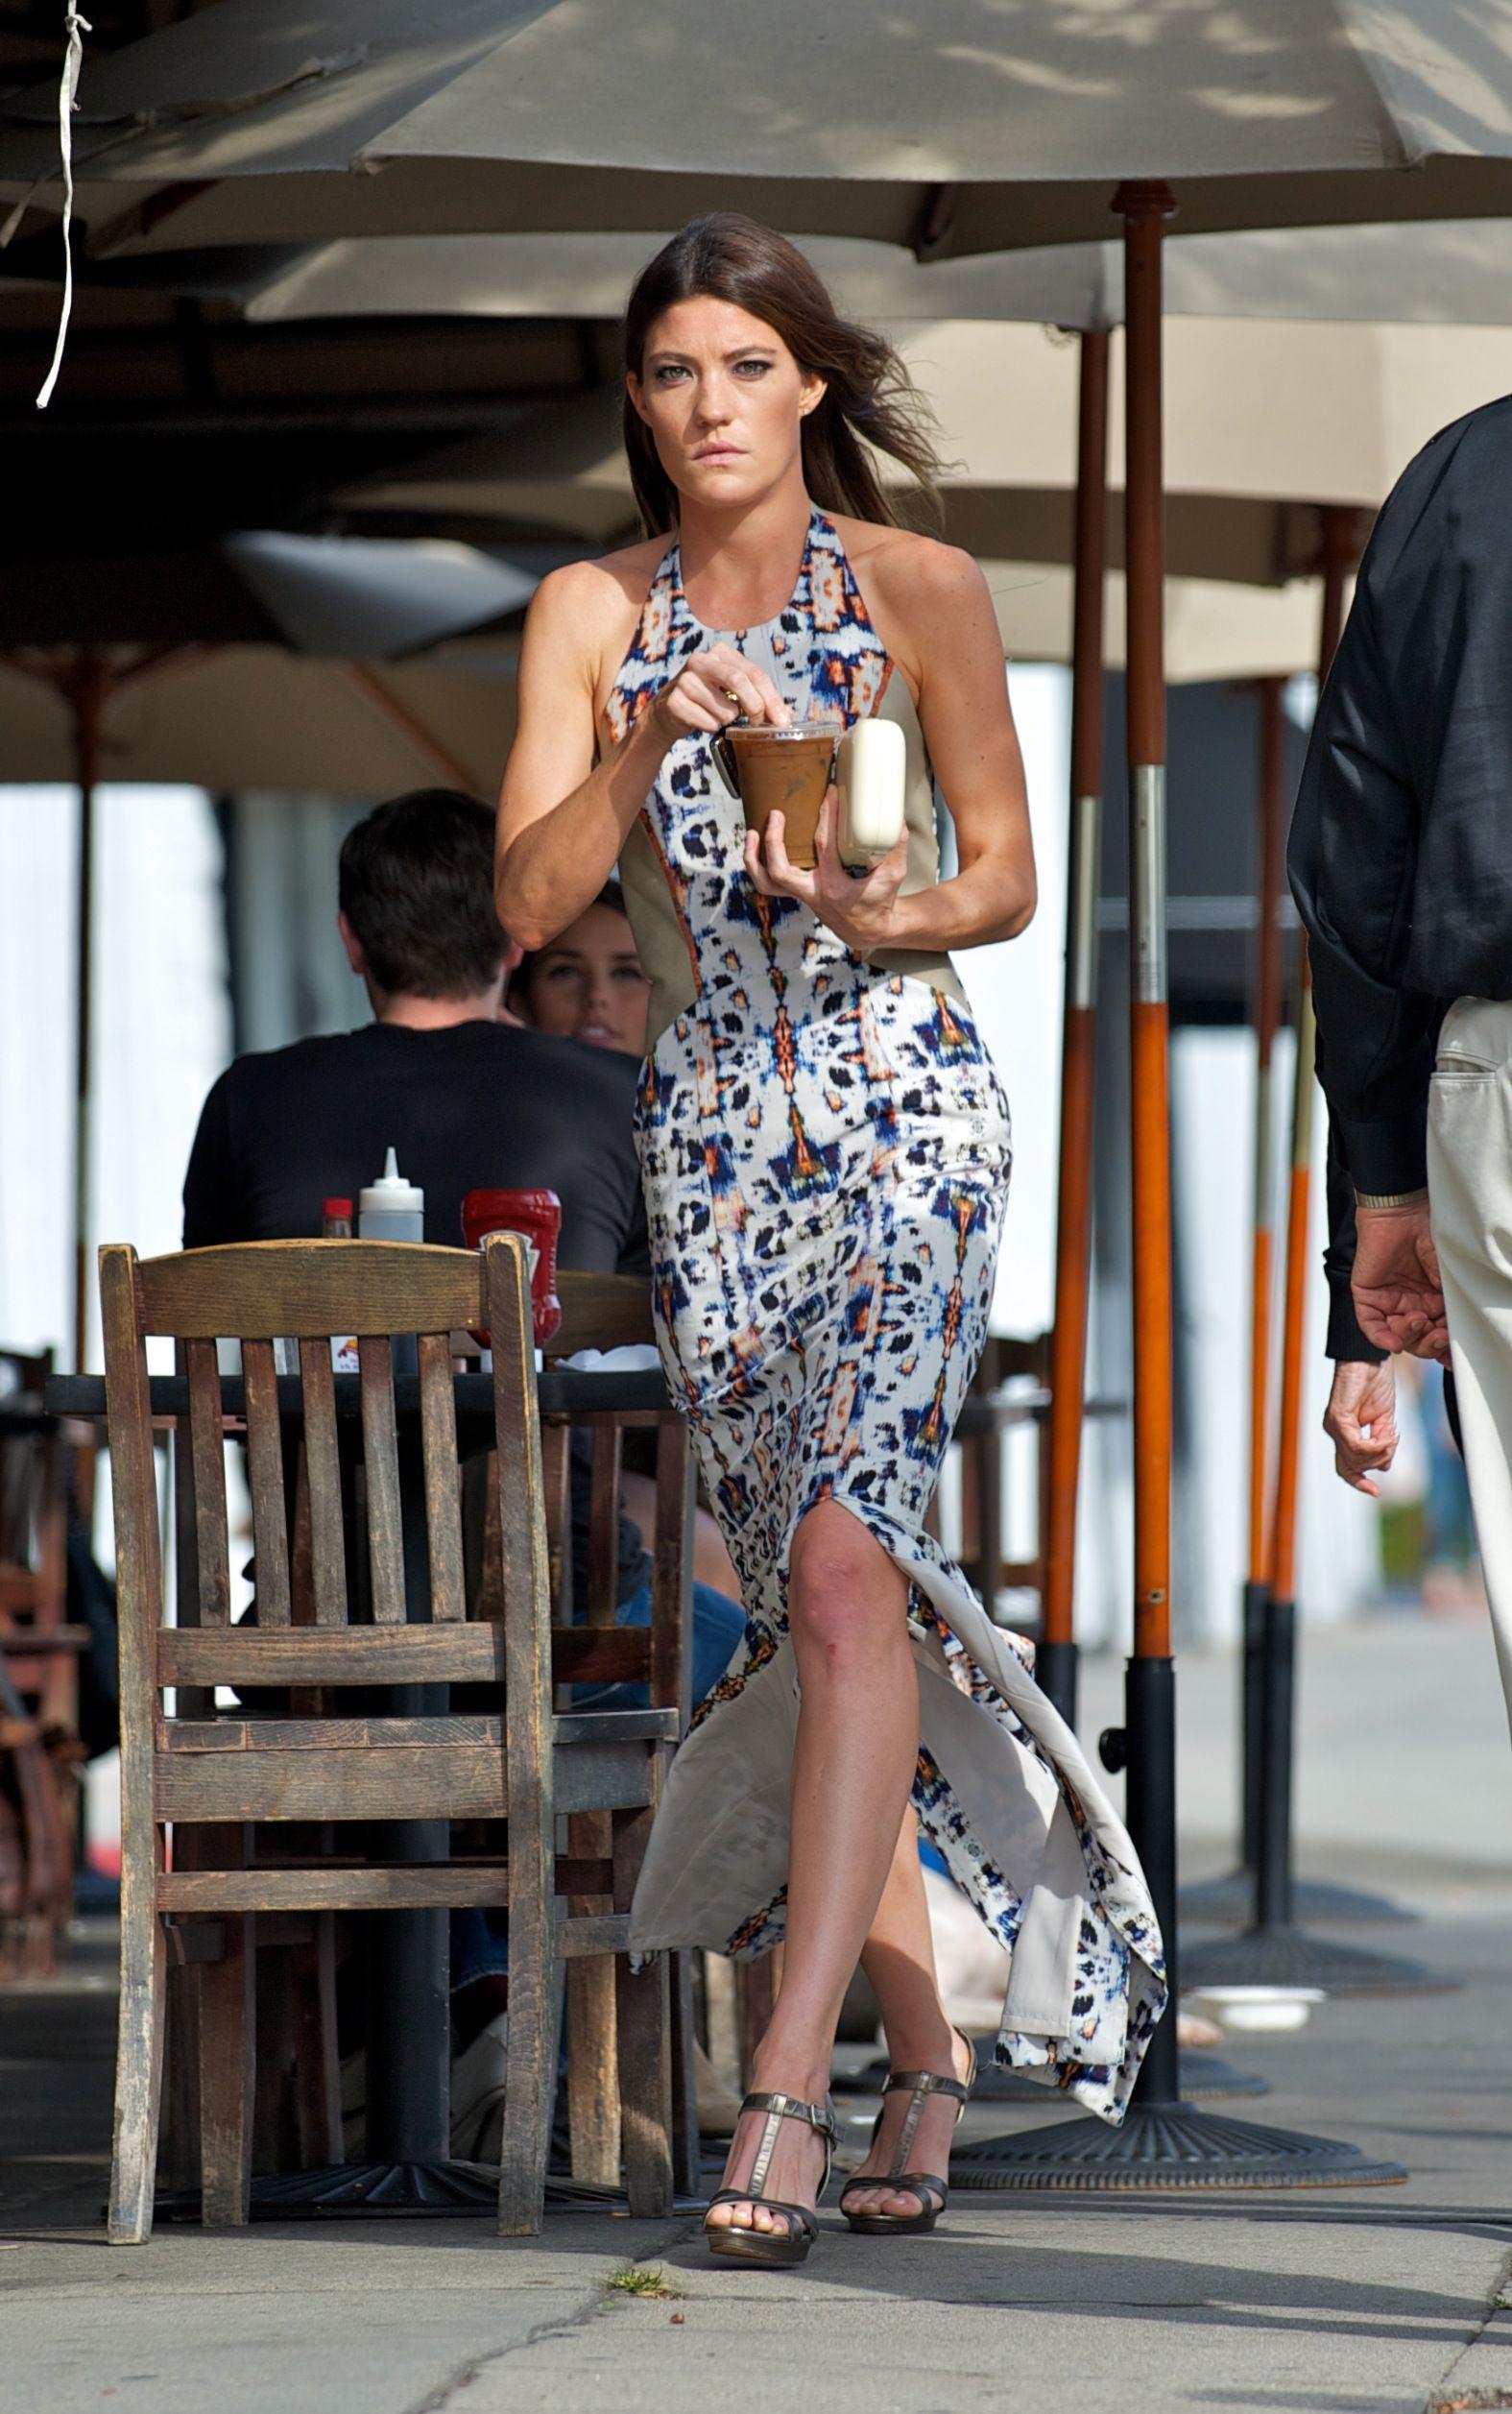 Jennifer Carpenter picks up an iced coffee King's Road Cafe in LA October 6, 2012